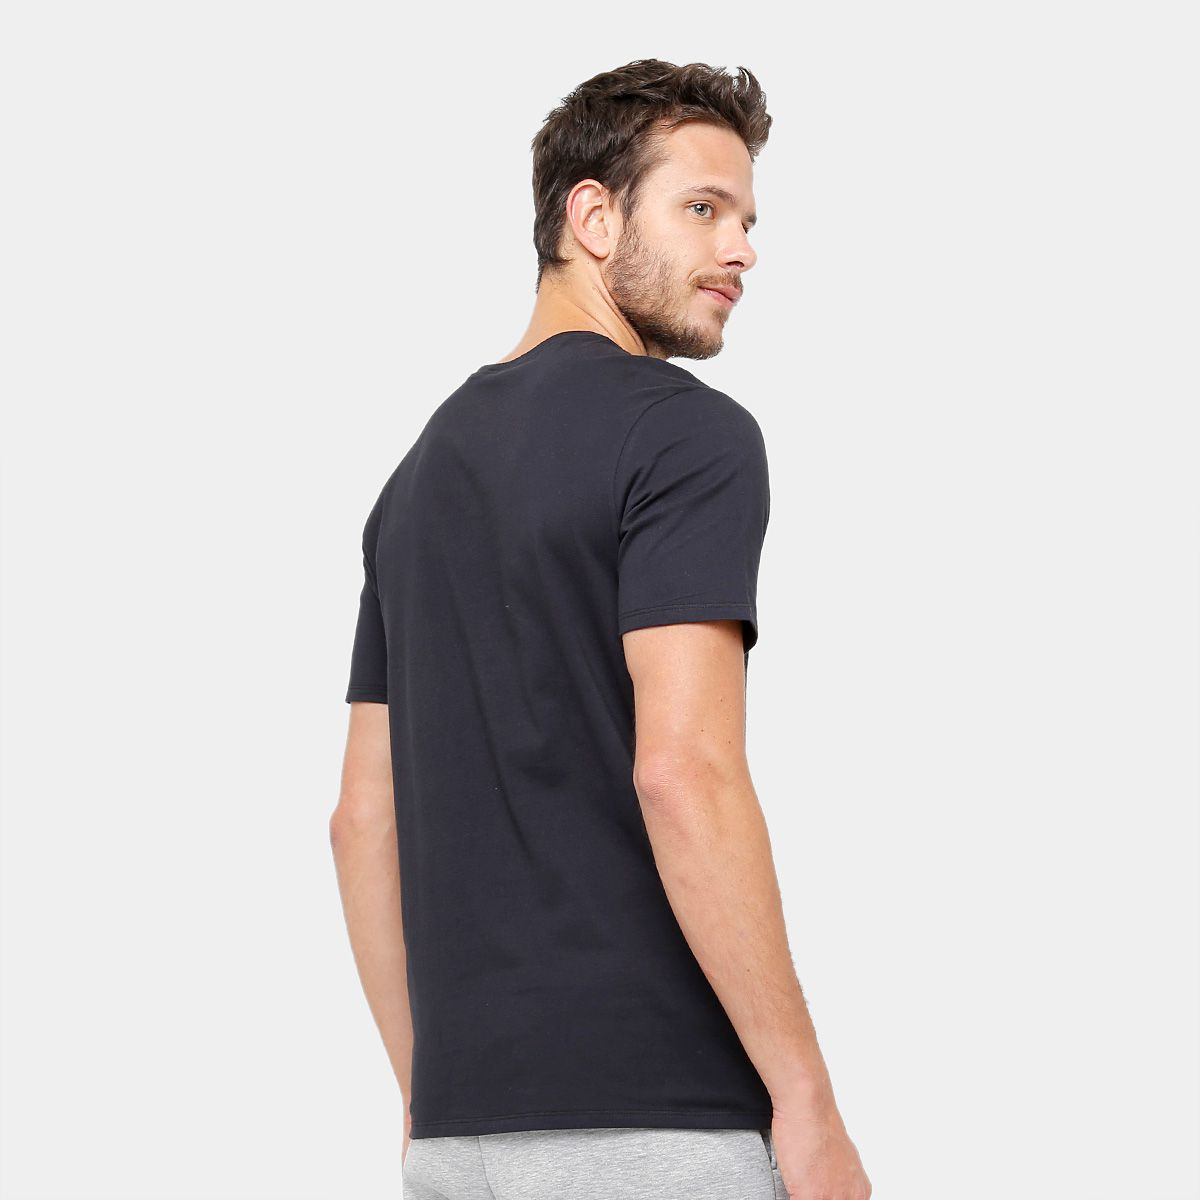 079e6cb191 Camiseta Nike Masculina Hangtag Swoosh - Preto - Titanes Esportes